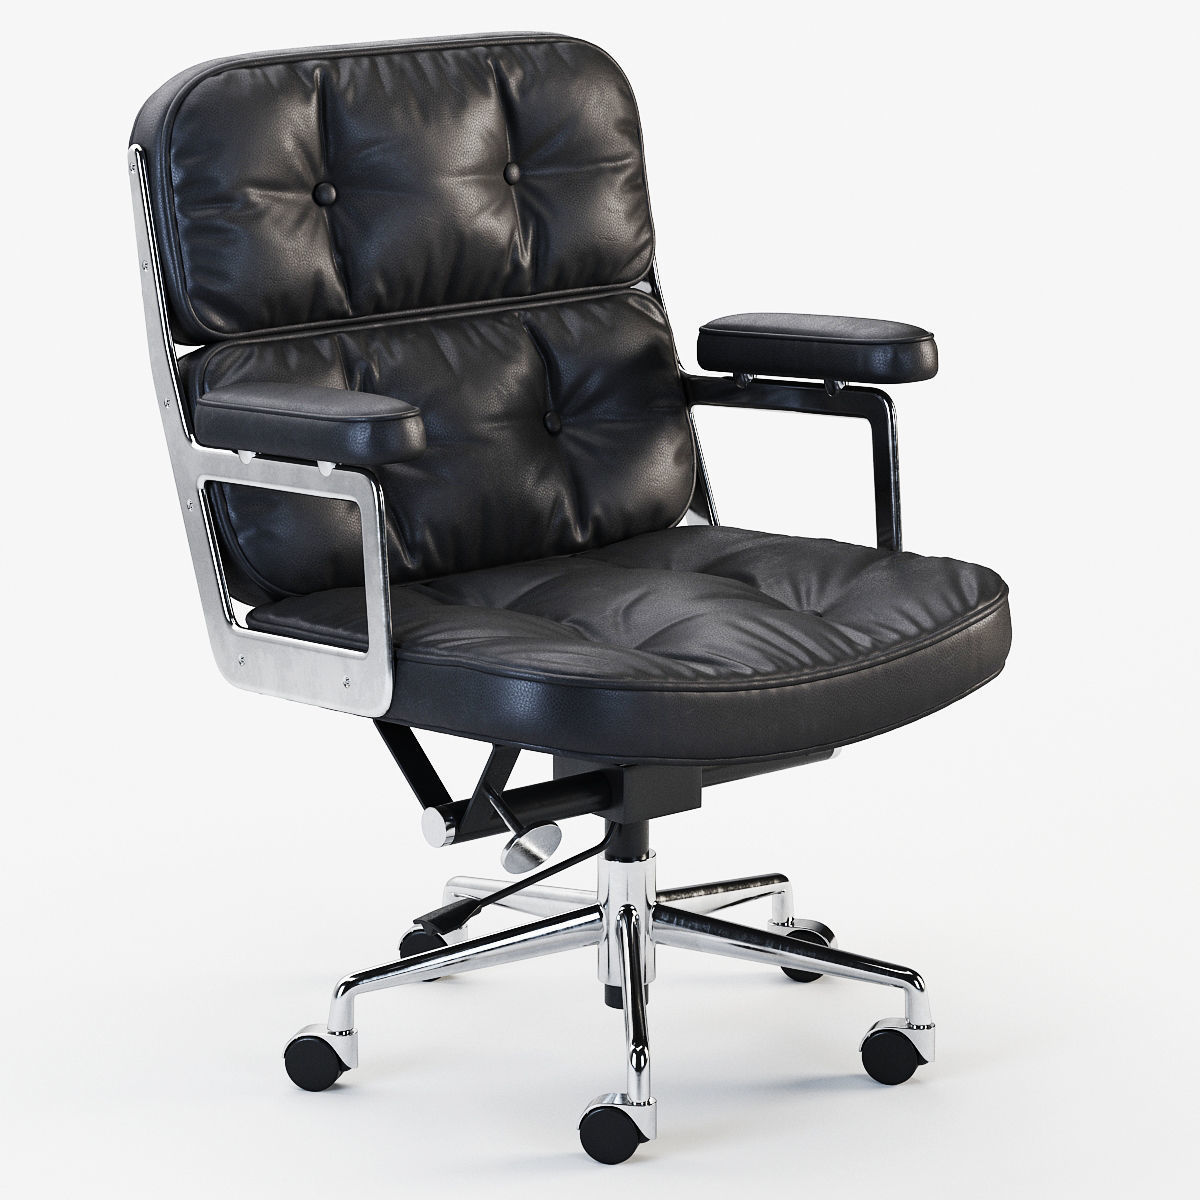 Eames Executive Lobby Chair